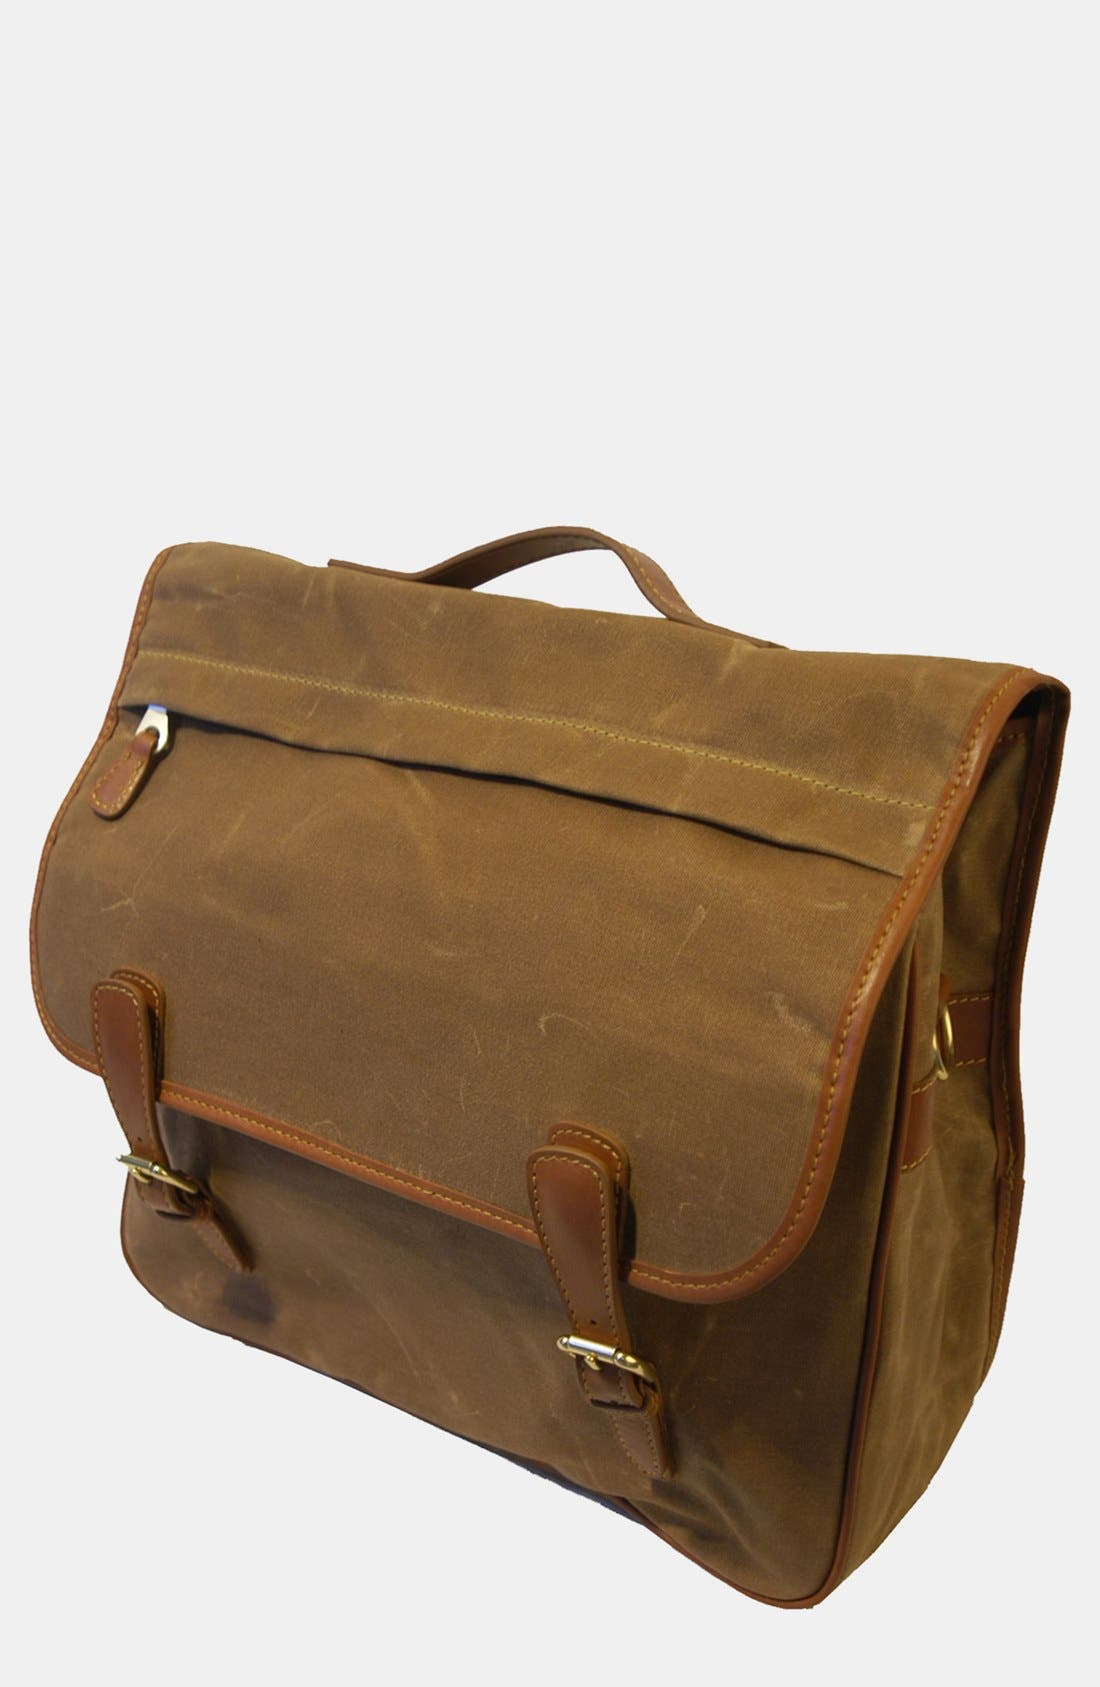 Main Image - Mulholland 'Lombard Street' Messenger Bag